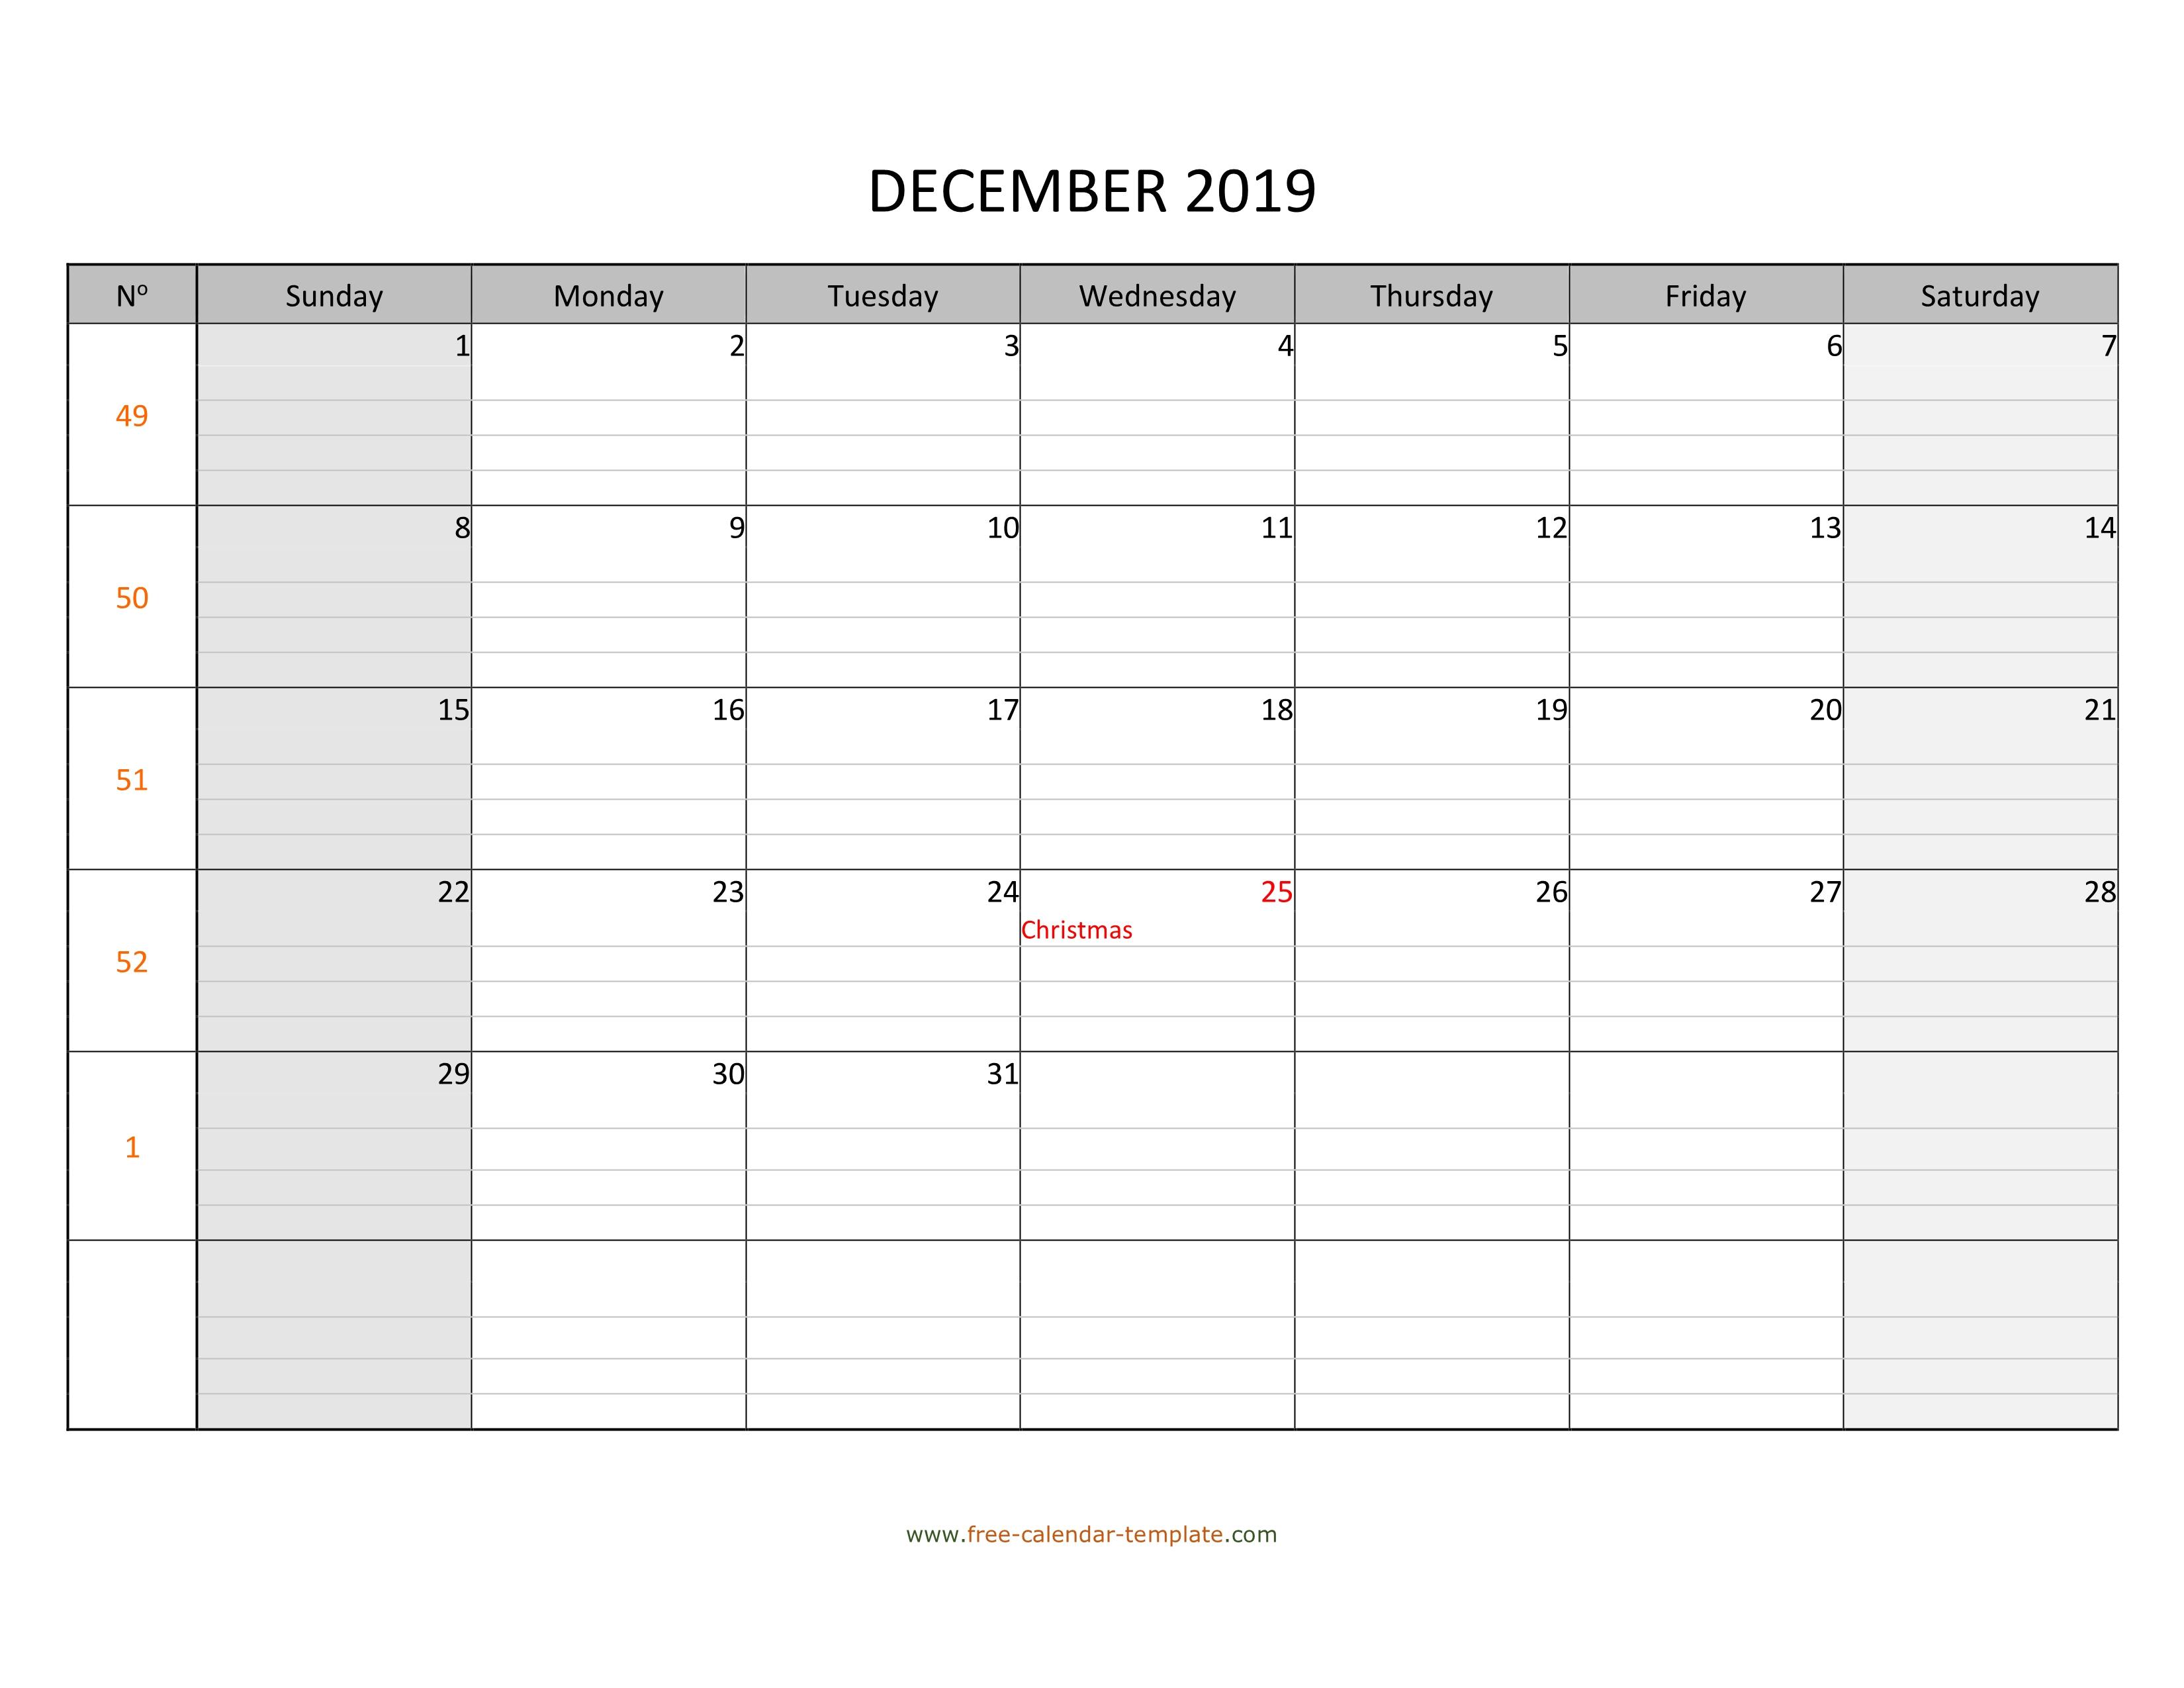 December 2019 Calendar Free Printable With Grid Lines